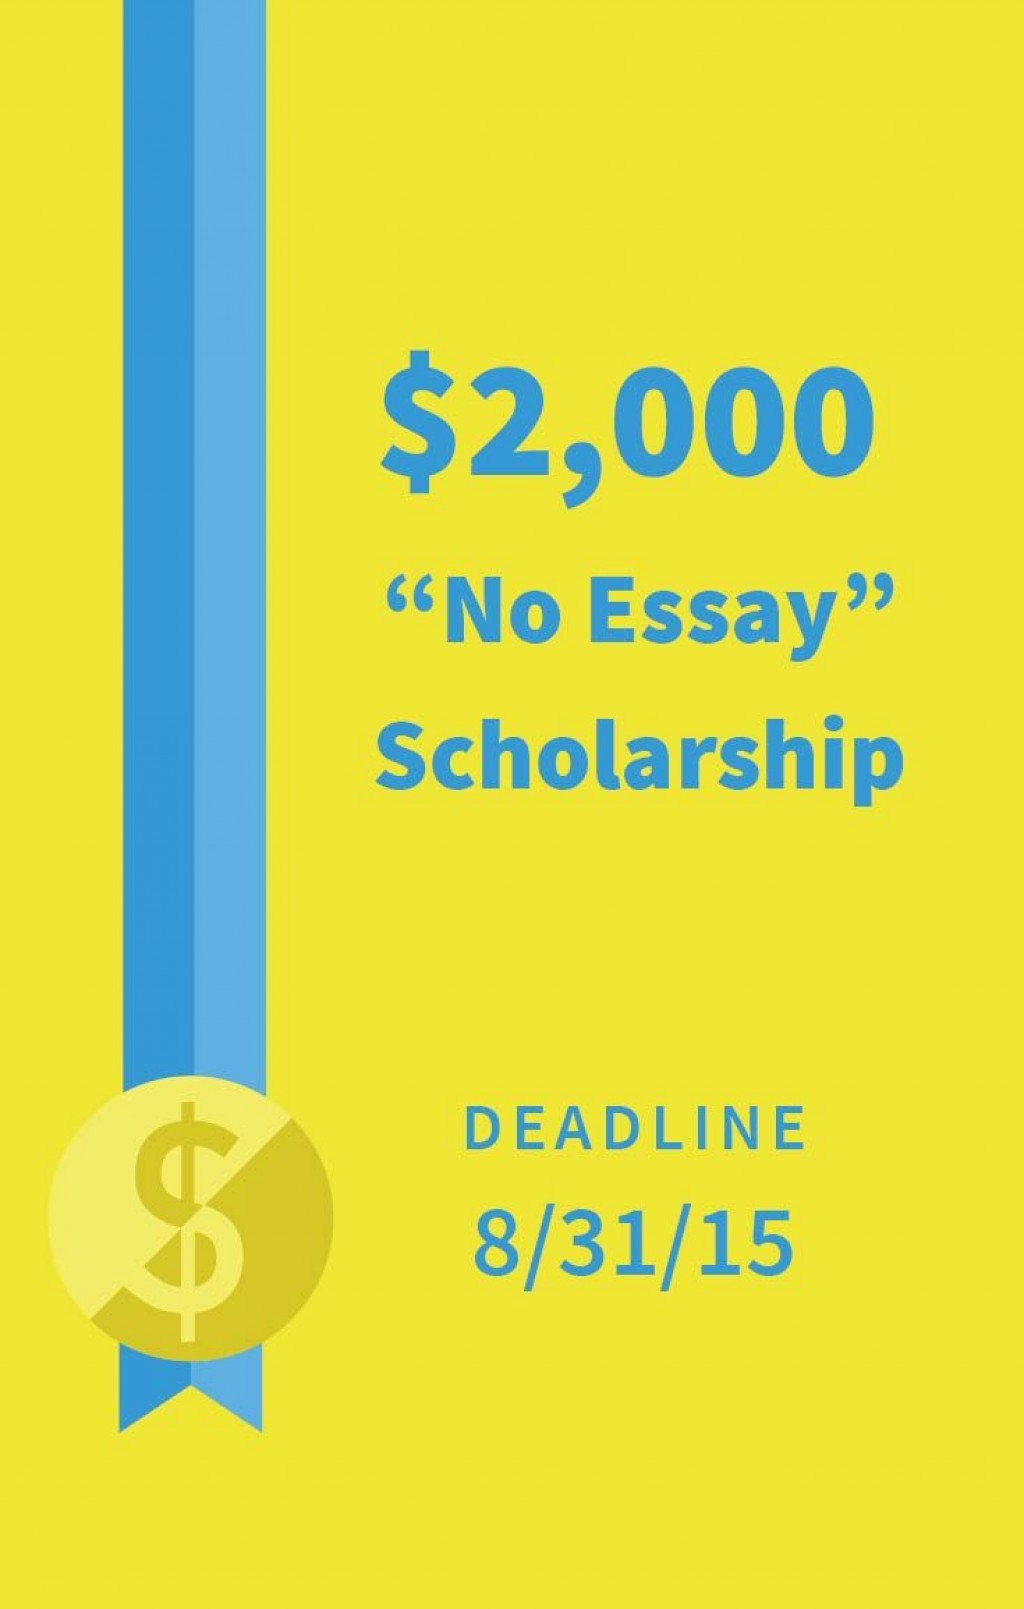 013 Niche No Essay Scholarship Marvelous Reddit Winners Large